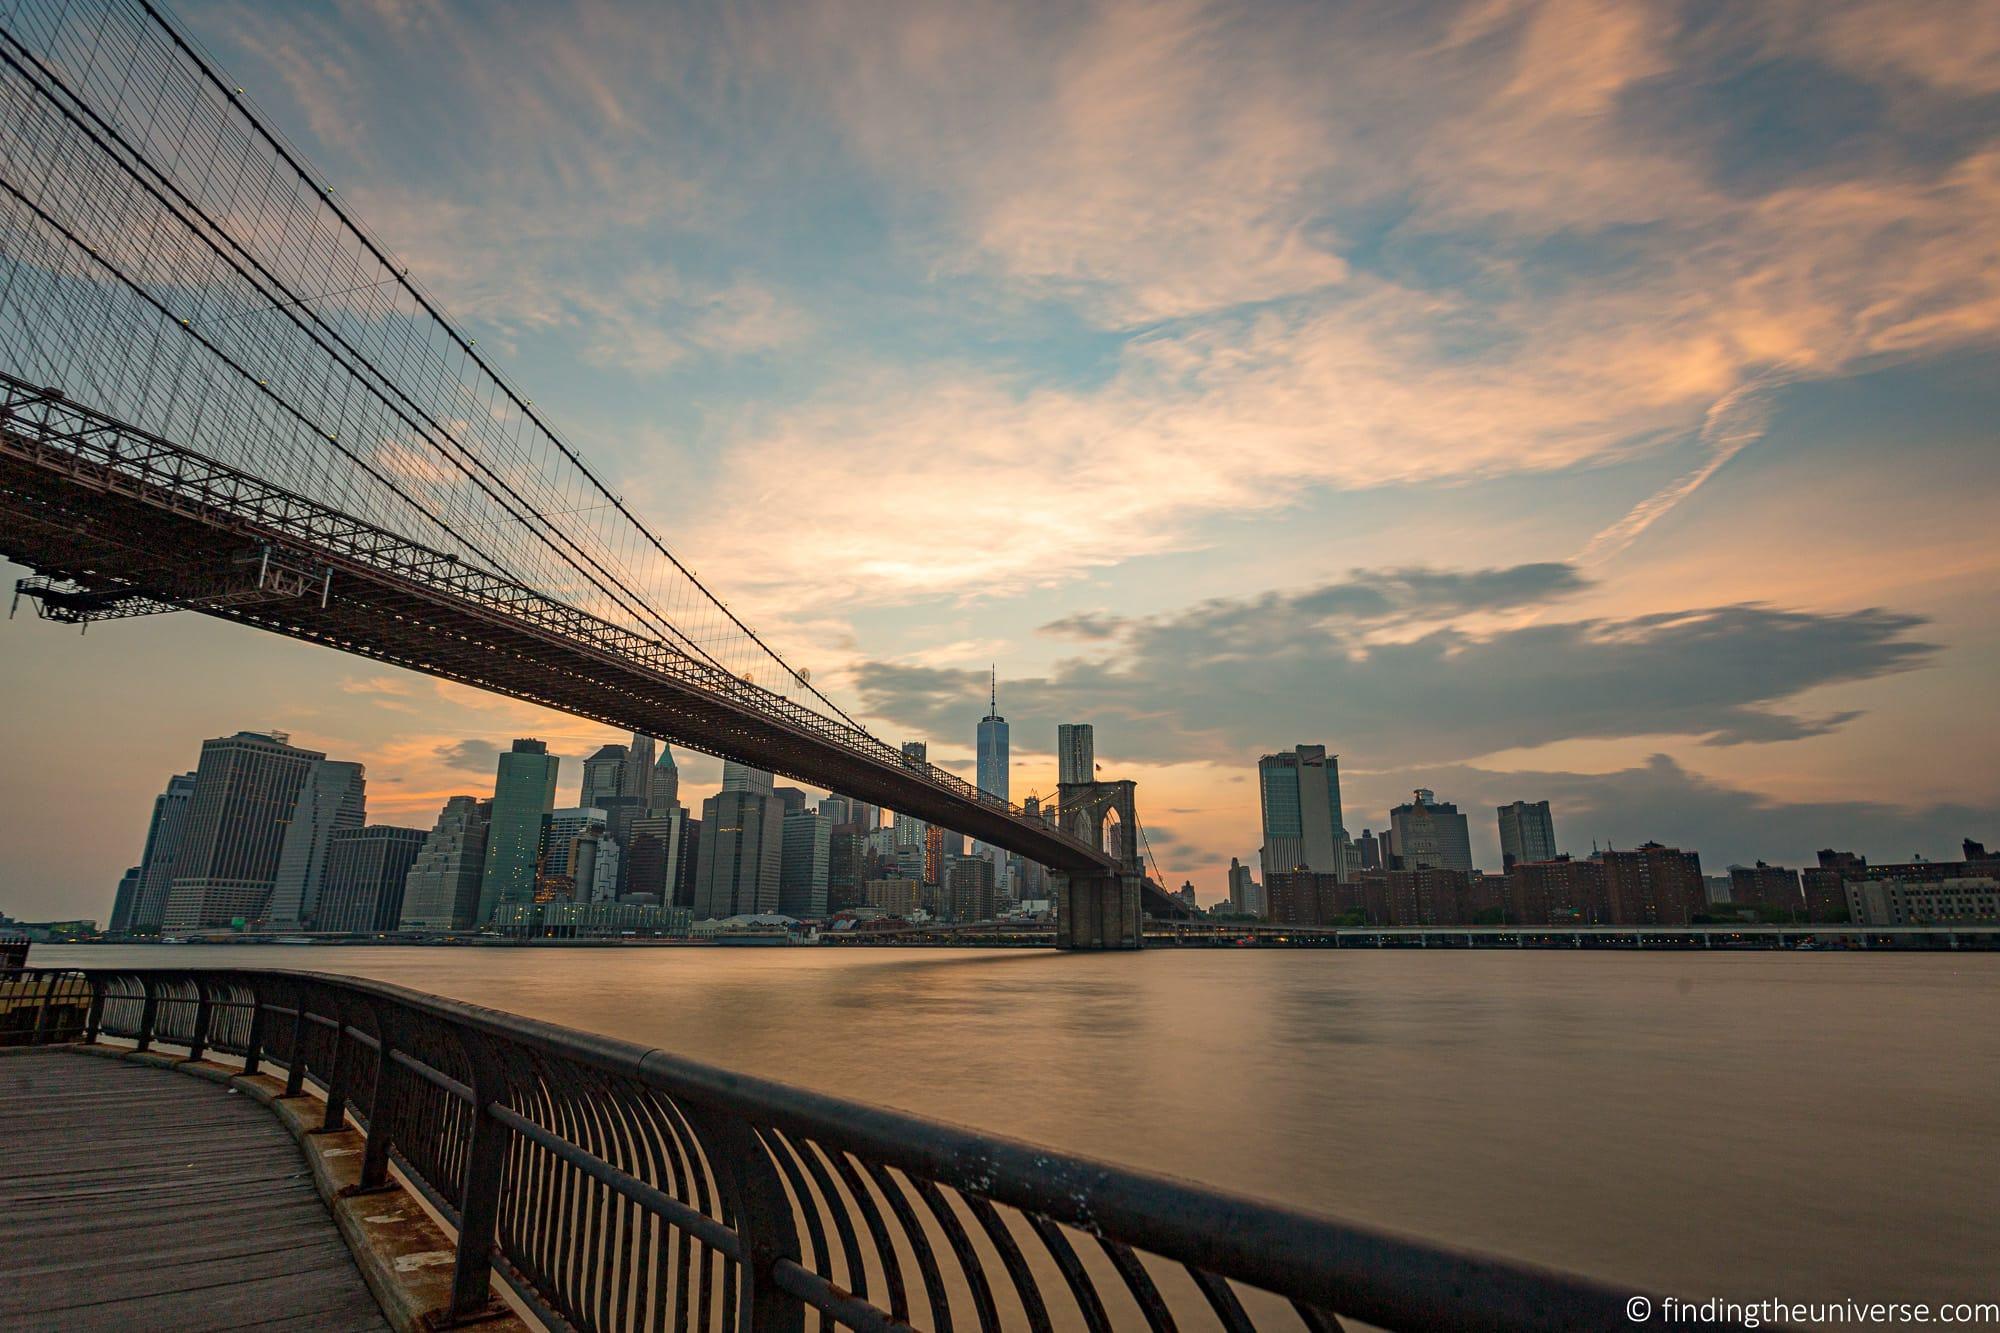 Sunset Brooklyn Bridge New York City itinerary